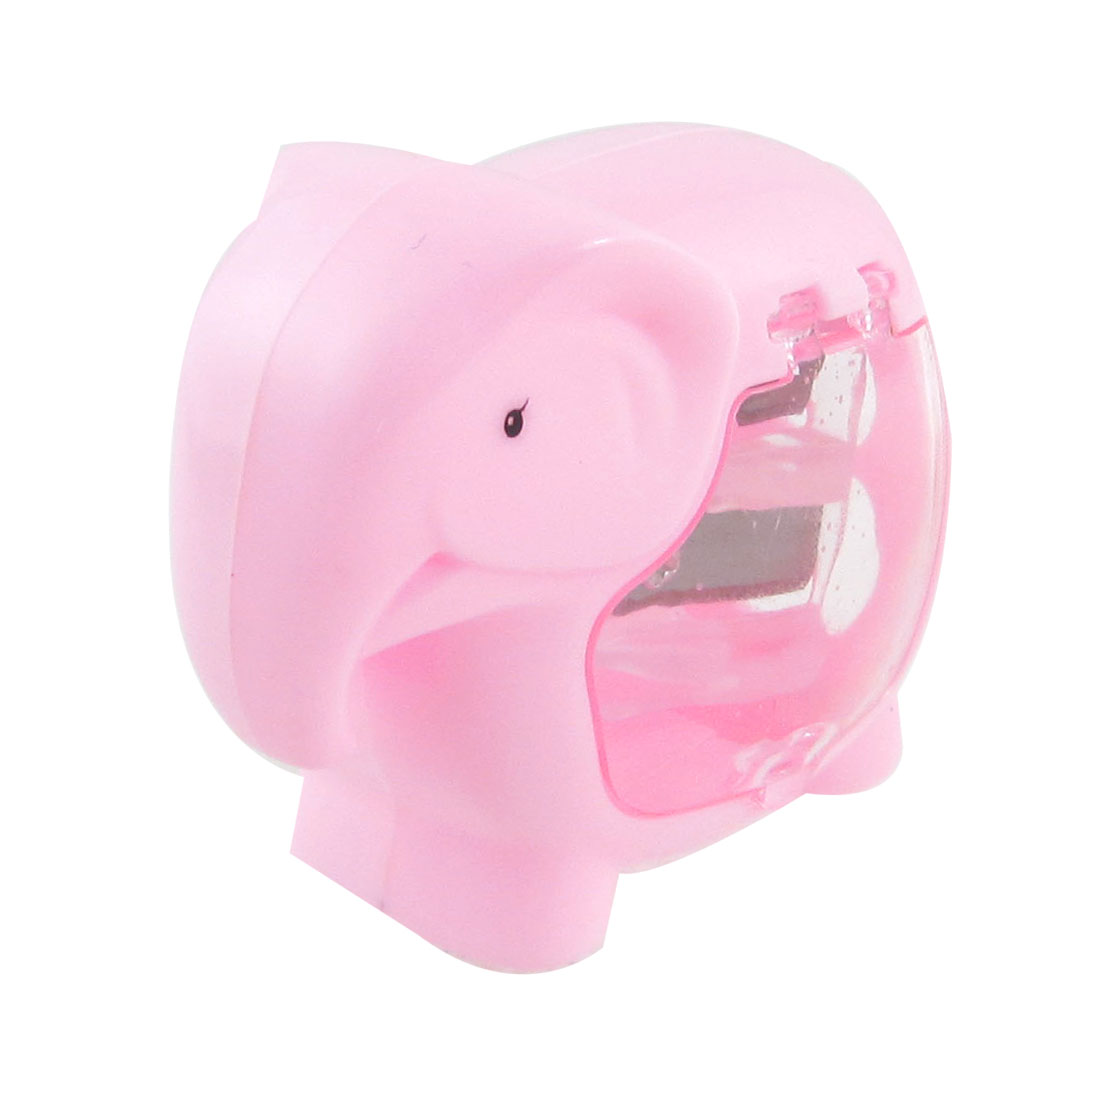 Pink Plastic Case Double Hole Elephant Shaped Pencil Sharpener